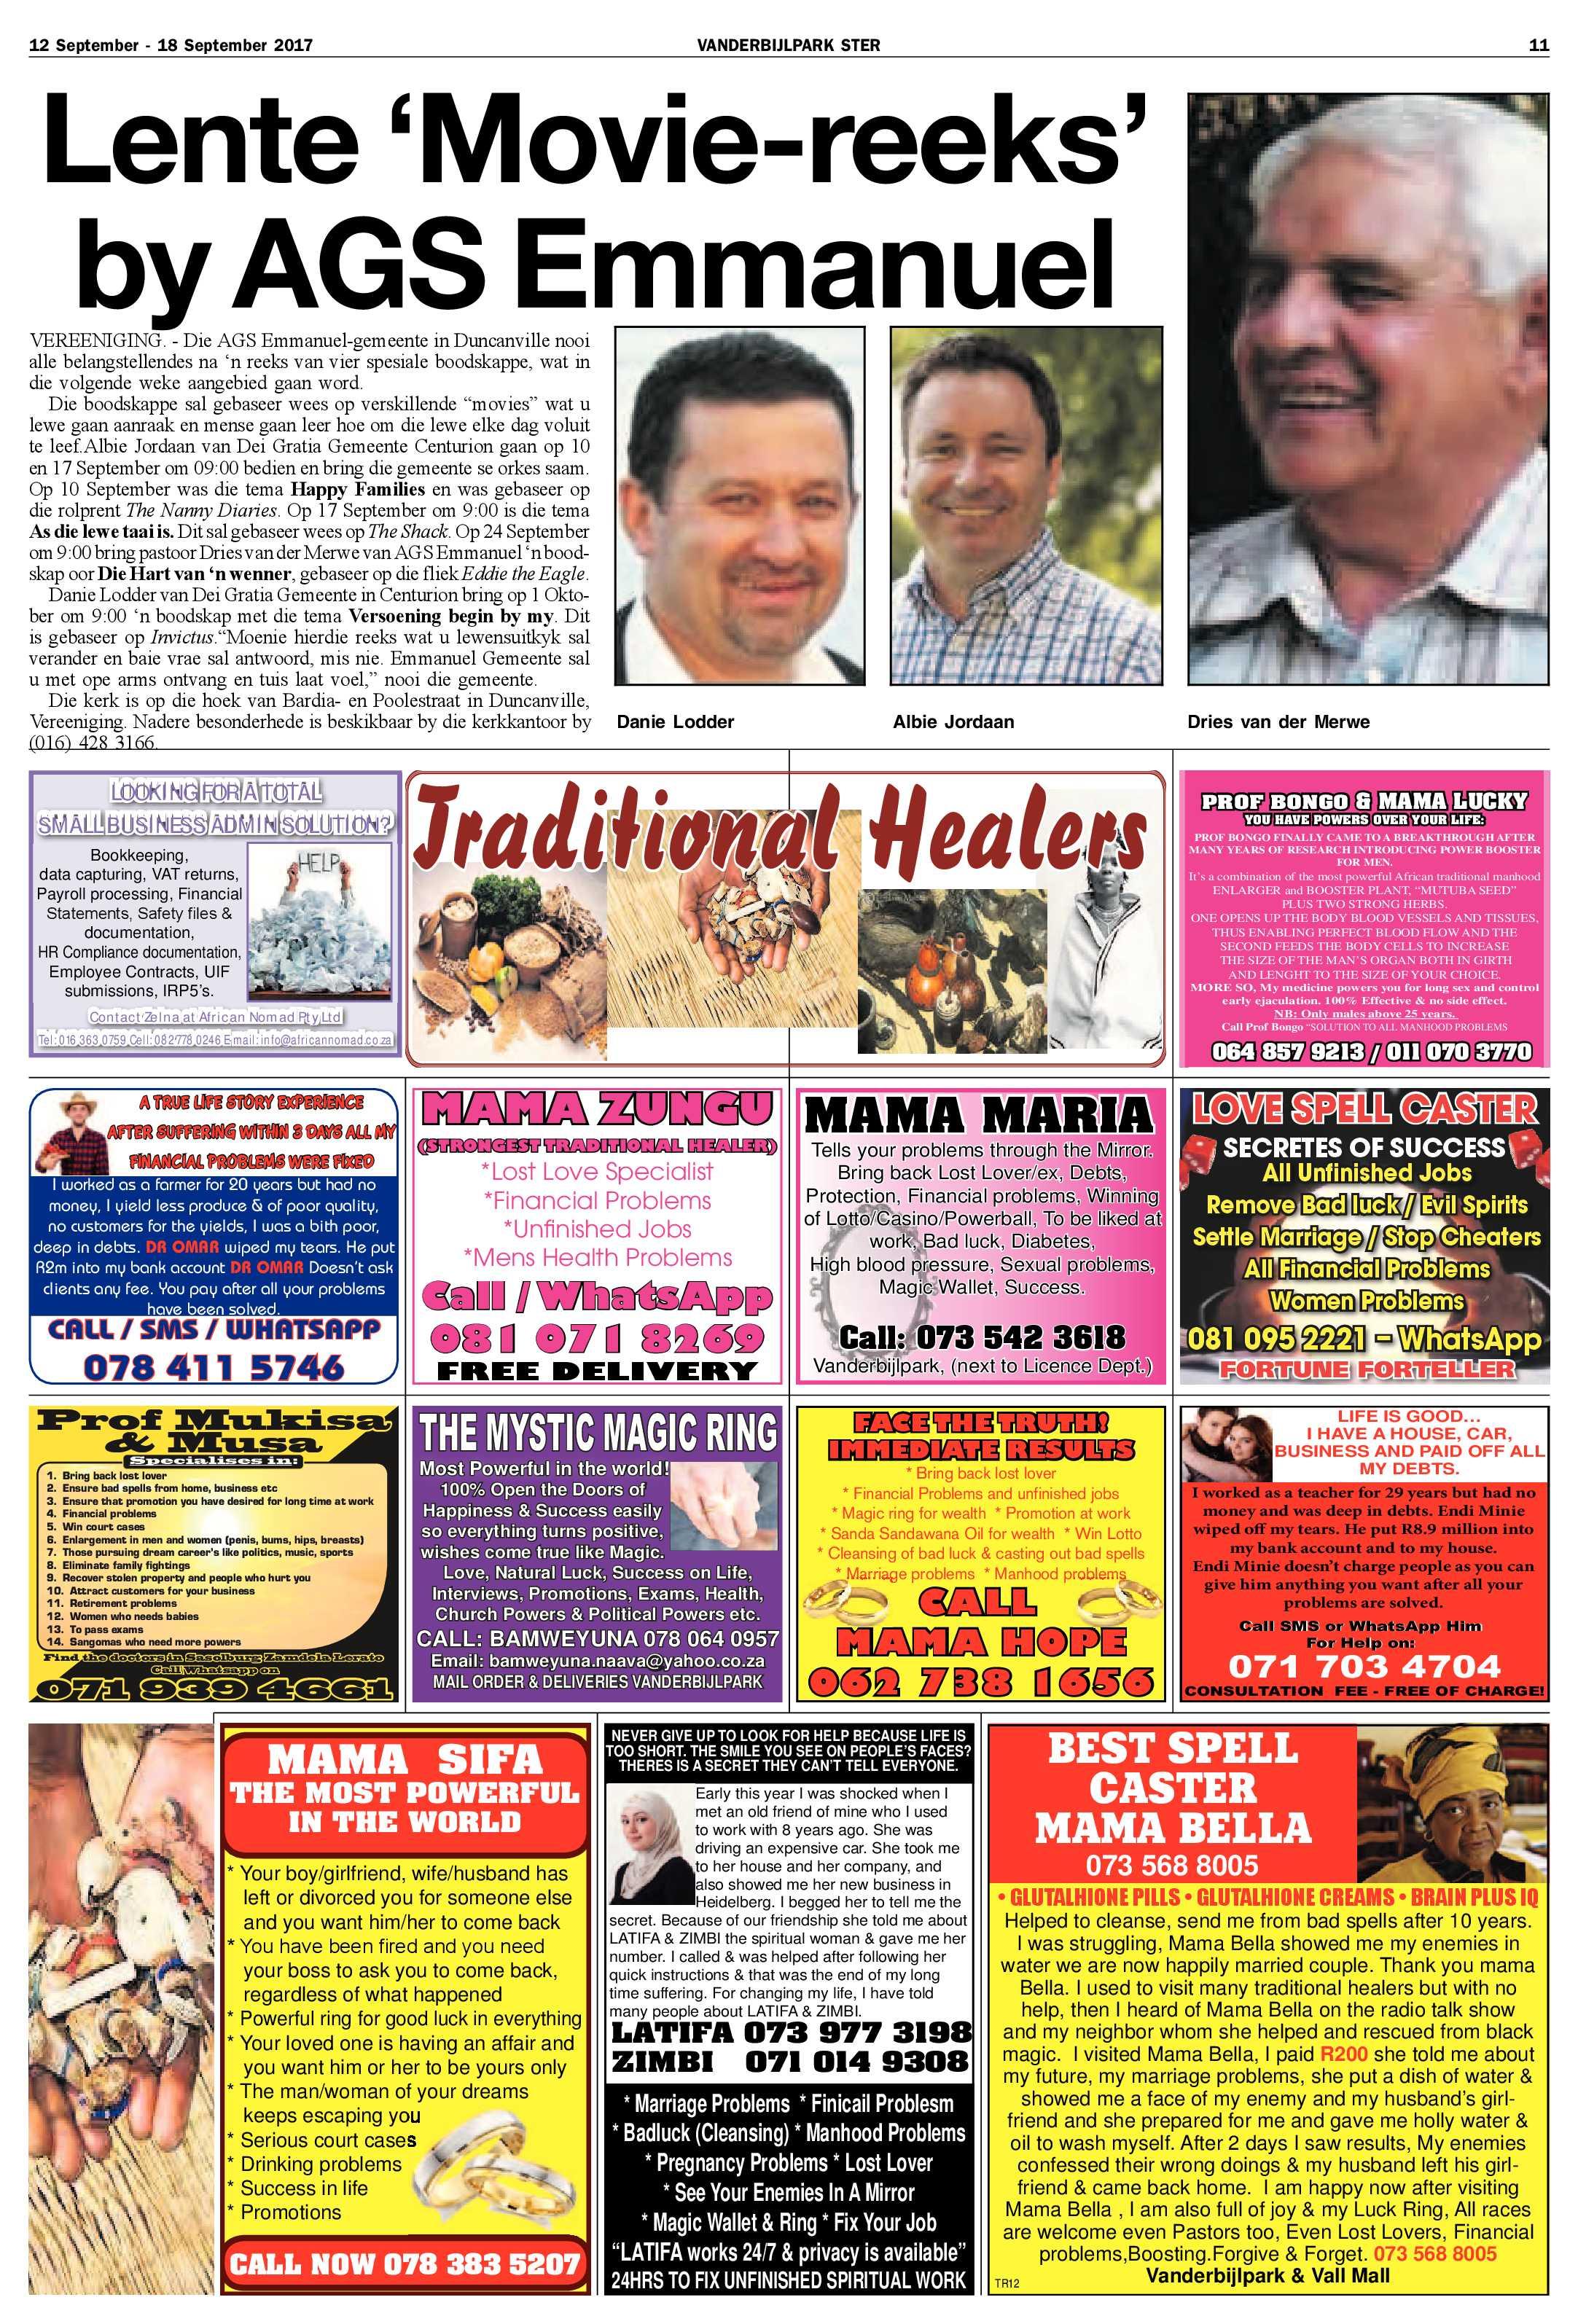 vanderbijlpark-ster-12-18-september-2017-epapers-page-11